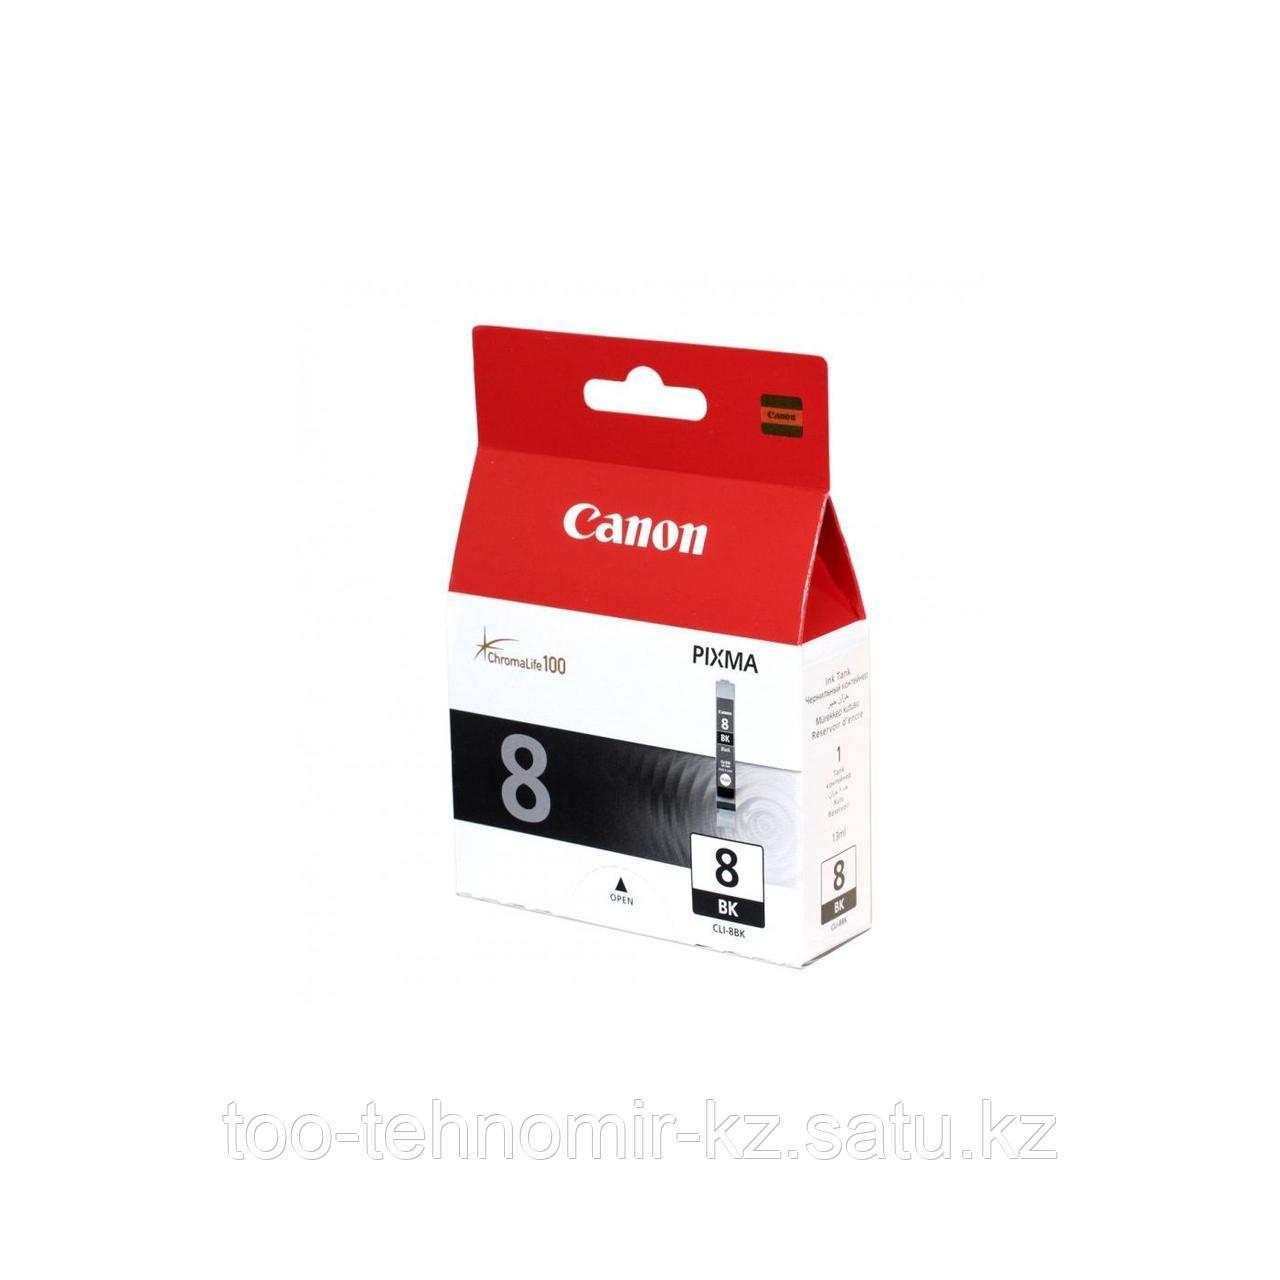 Картридж Canon CLI-8BK Pixma IP4200/5300